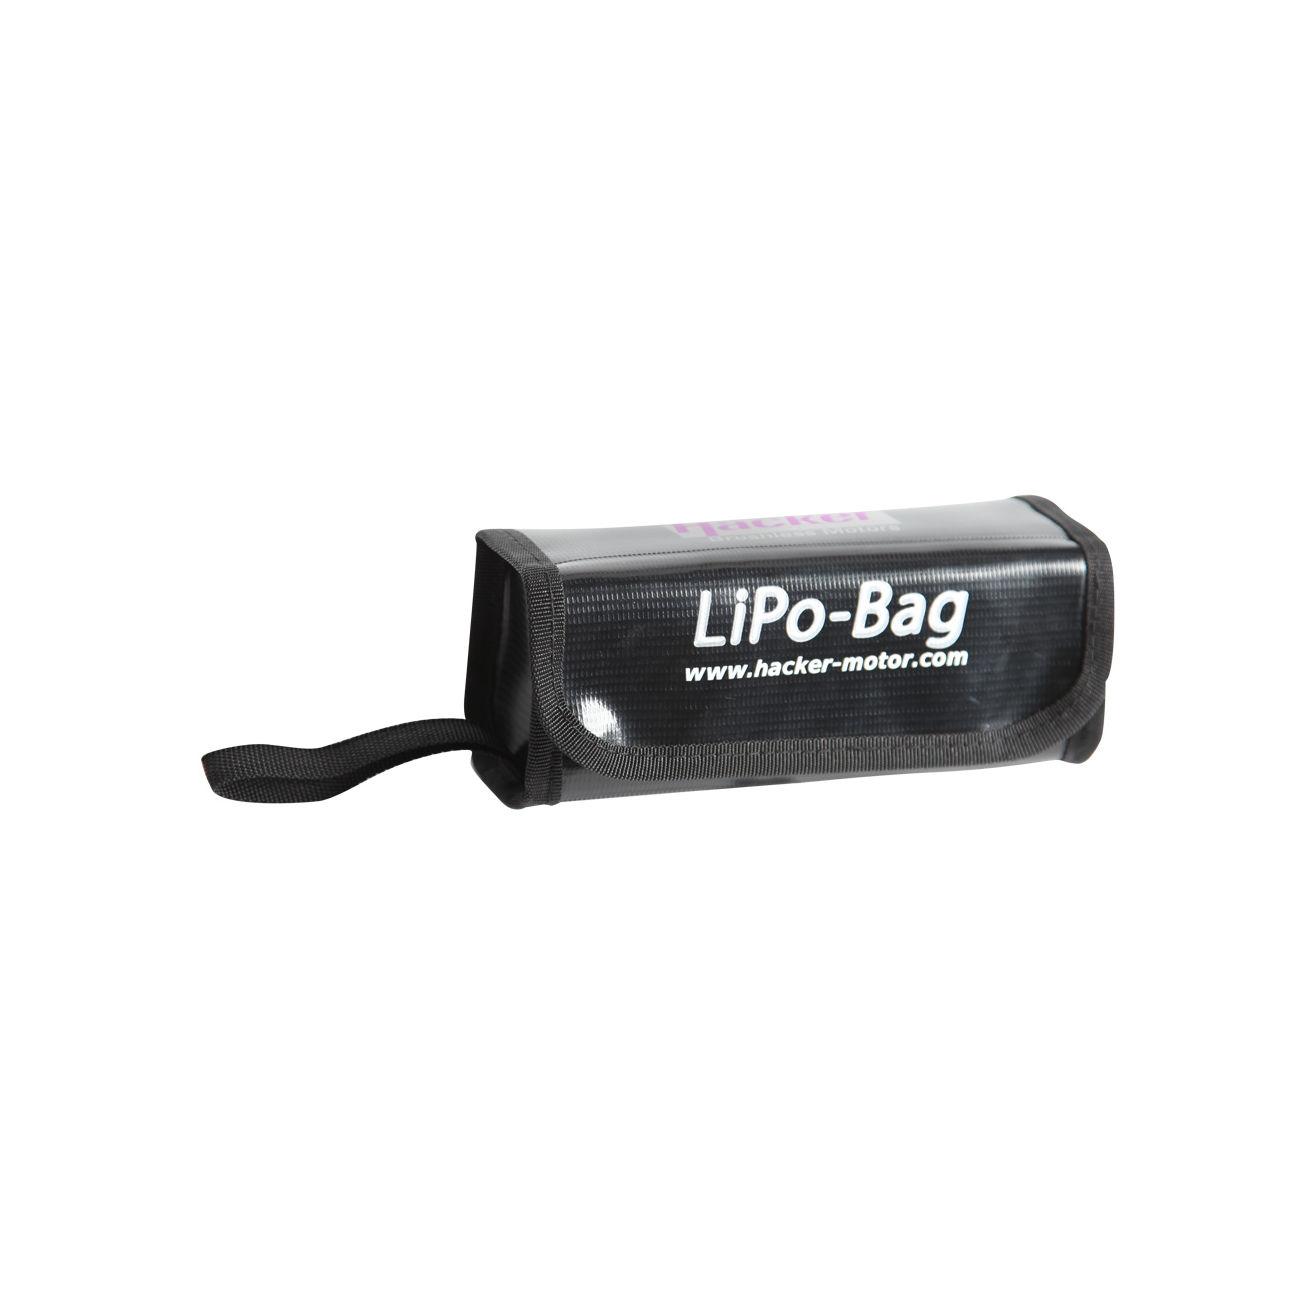 Hacker lipo bag schutztasche 150x45x60mm 29990010 kotte for Lipo schreibtisch